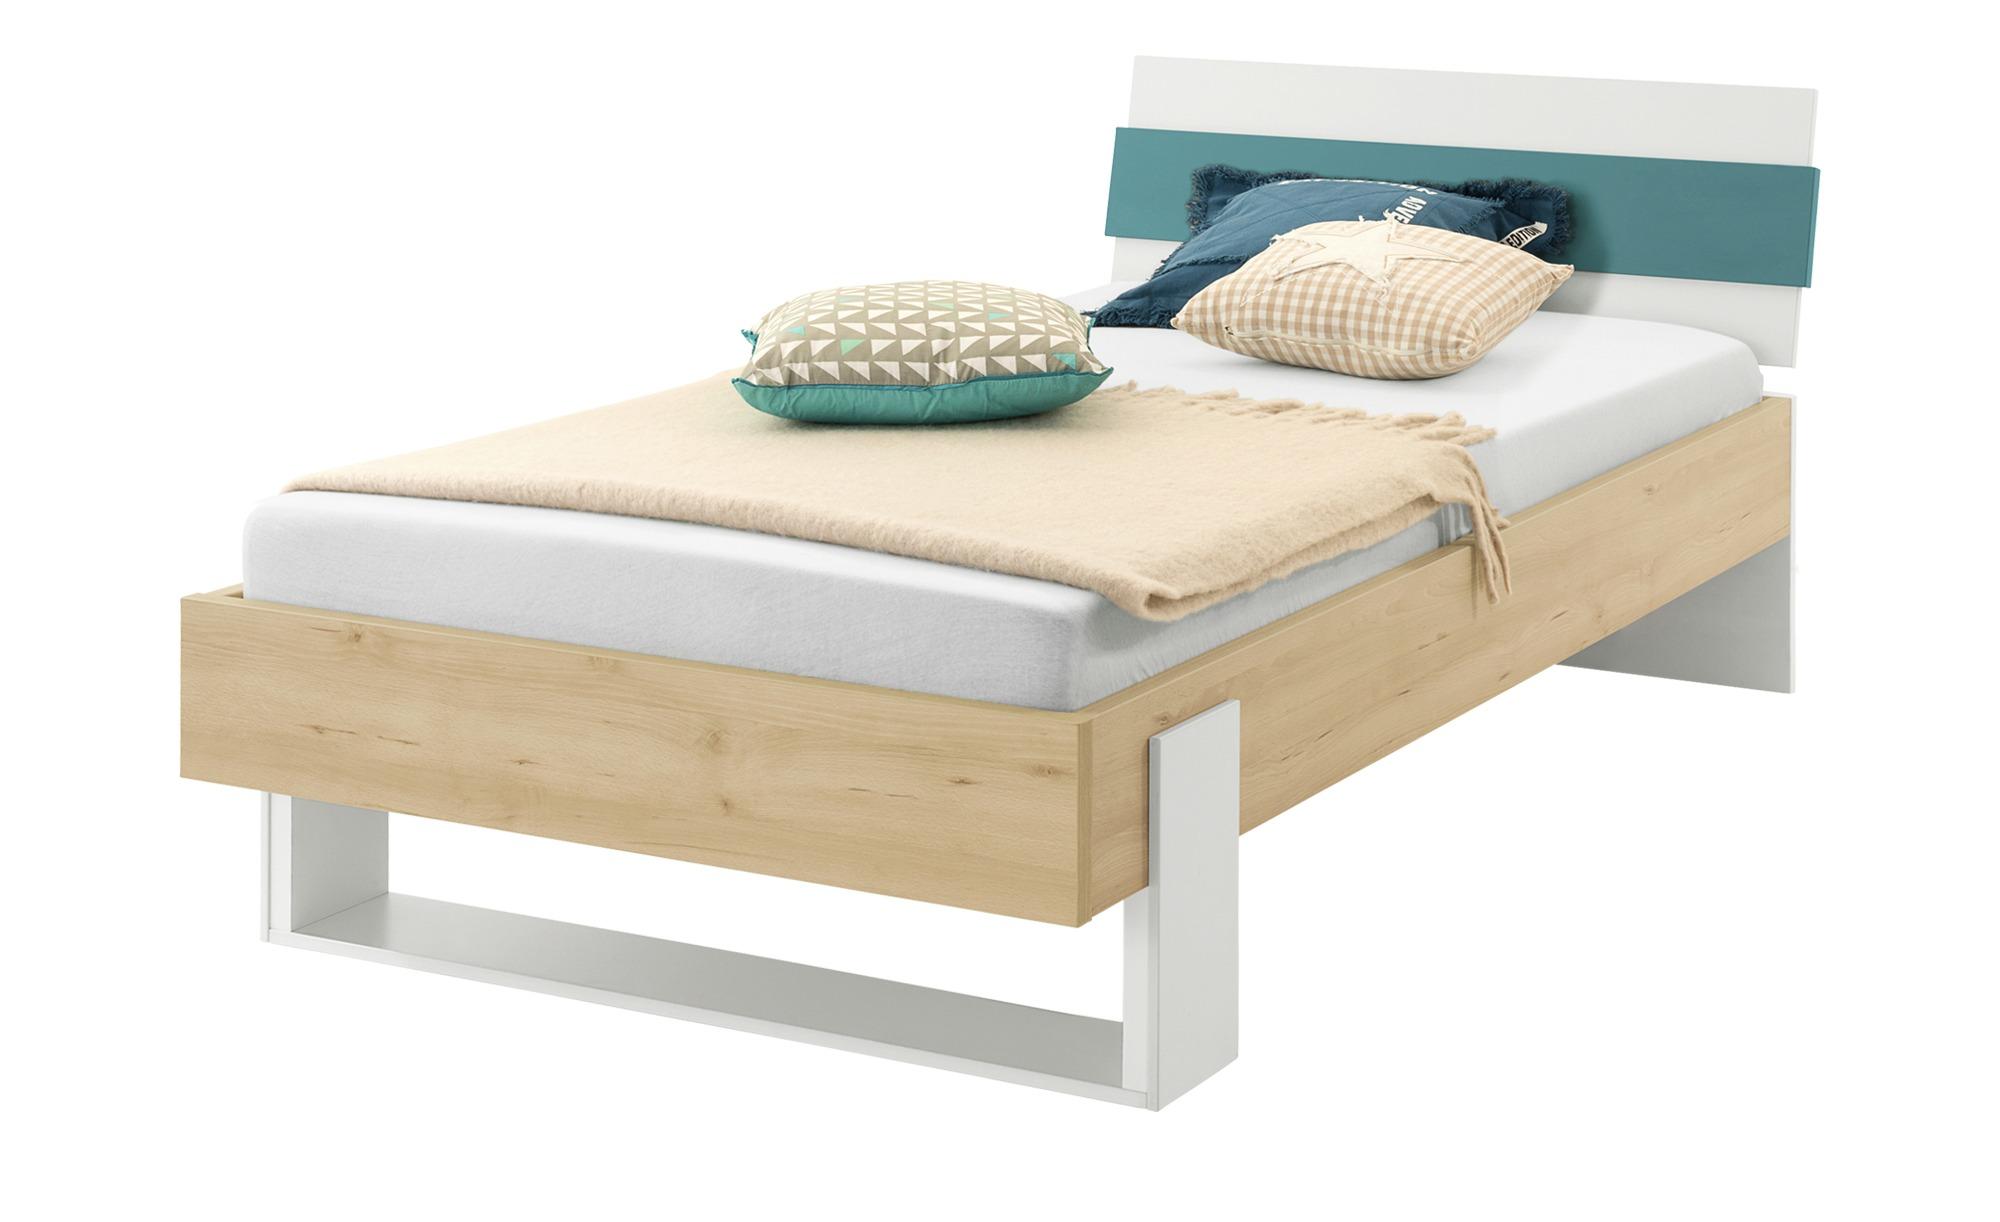 Bett - holzfarben - 108,8 cm - 86 cm - 210 cm - Jugendmöbel > Jugendbetten - Möbel Kraft | Kinderzimmer > Jugendzimmer > Jugendbetten | Sconto